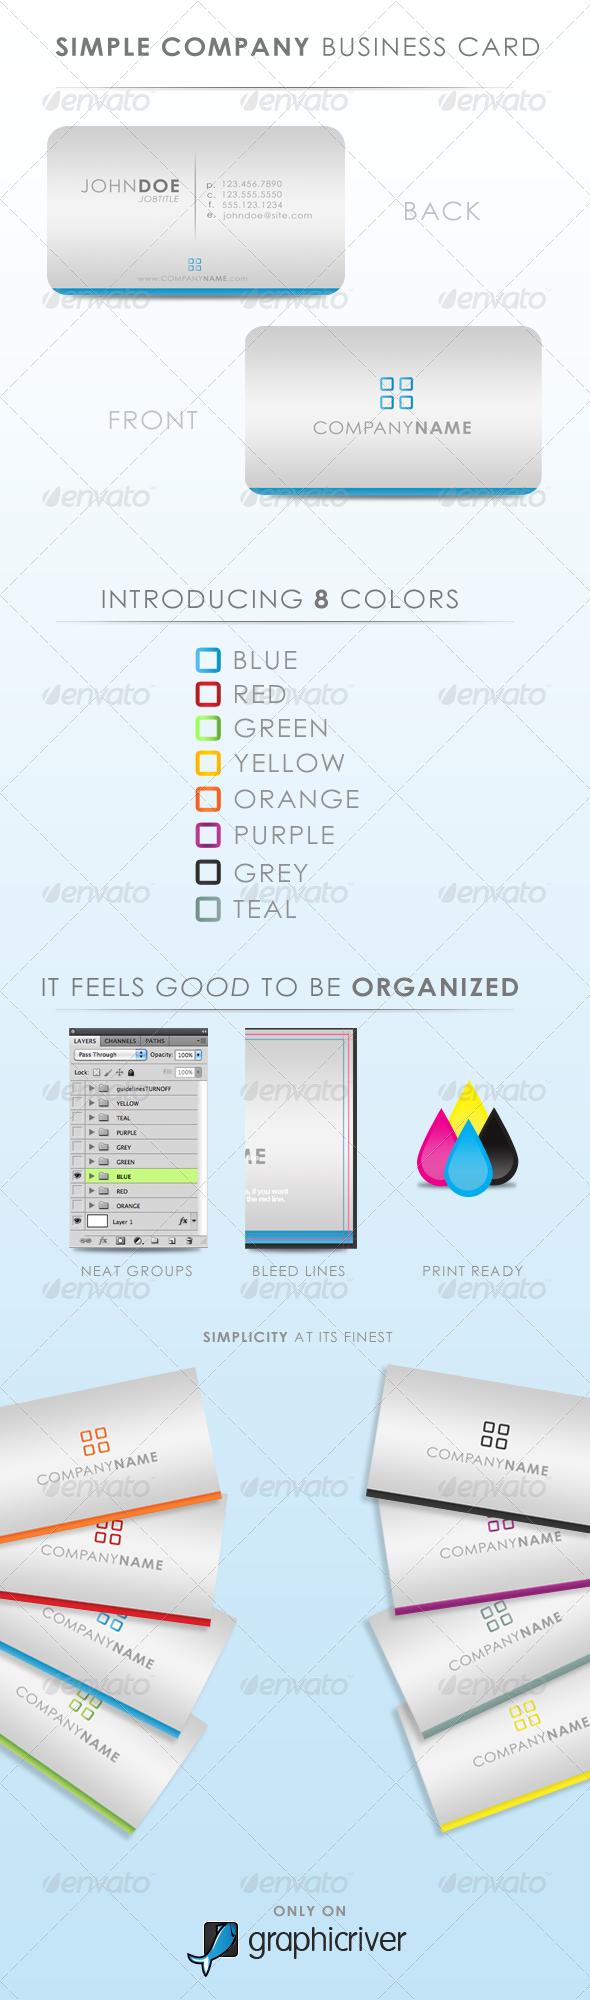 GraphicRiver Simply Company Business Card 202146